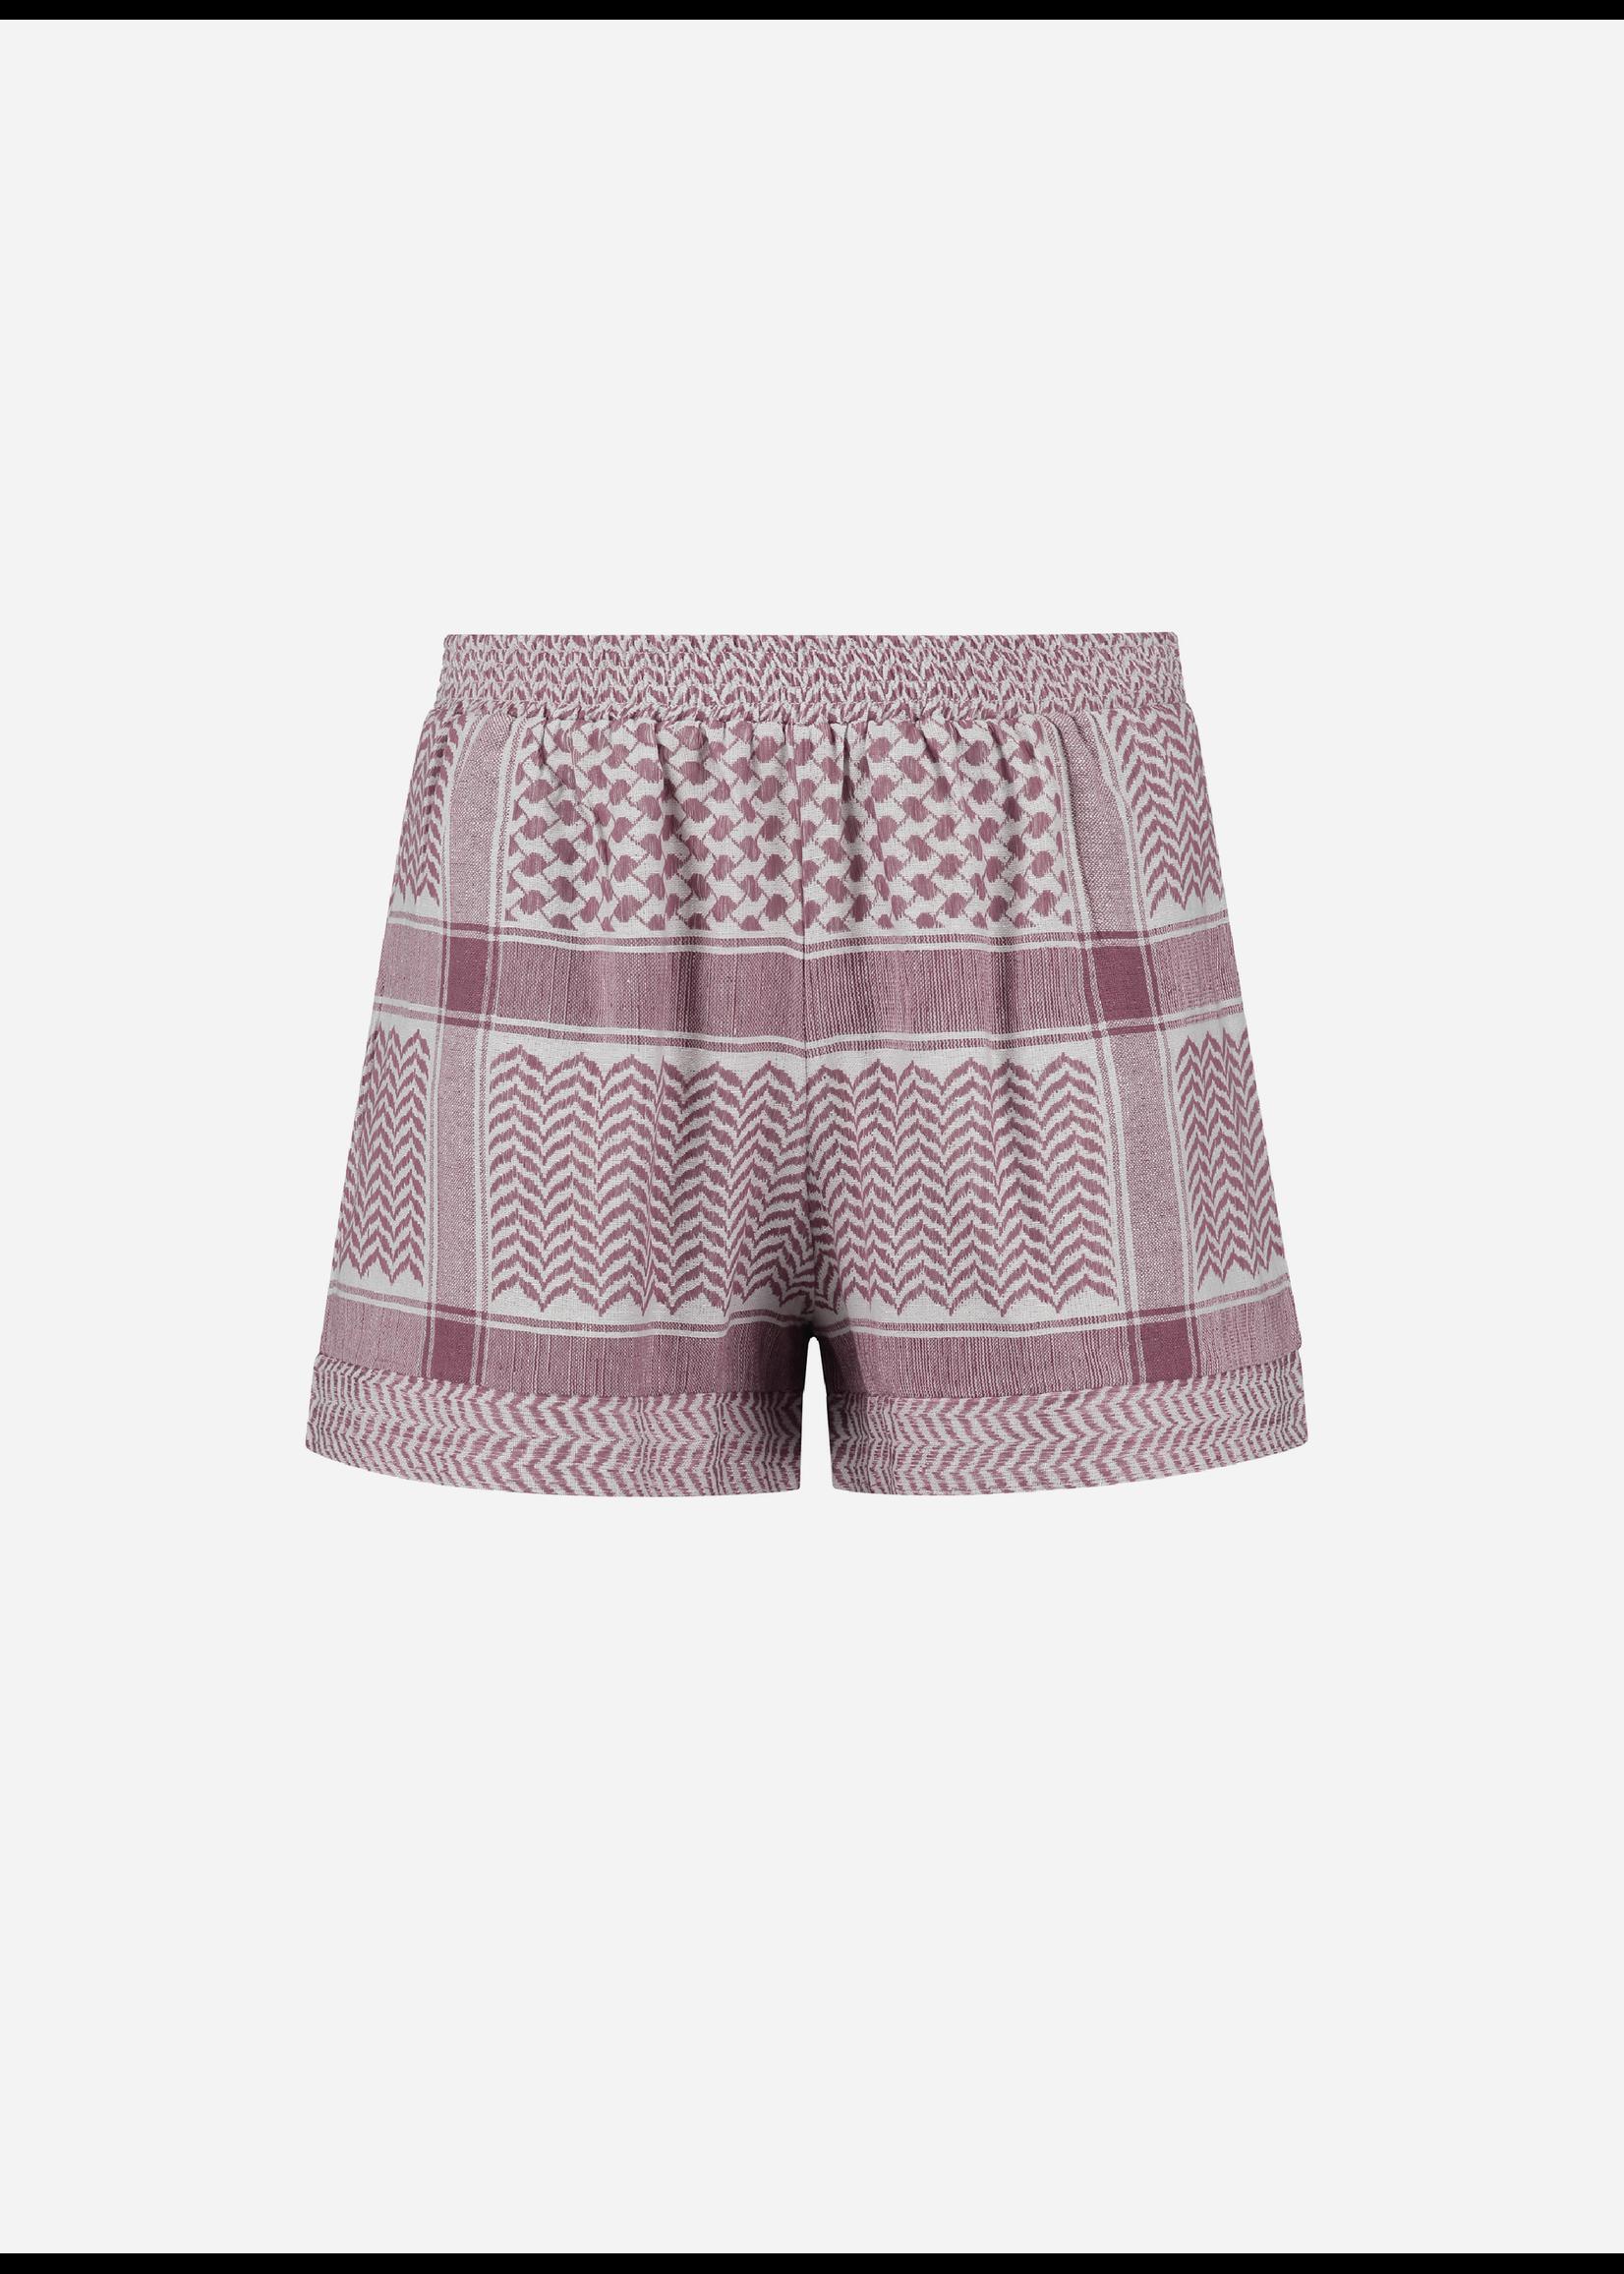 Rough Studios Devito shorts pink/white